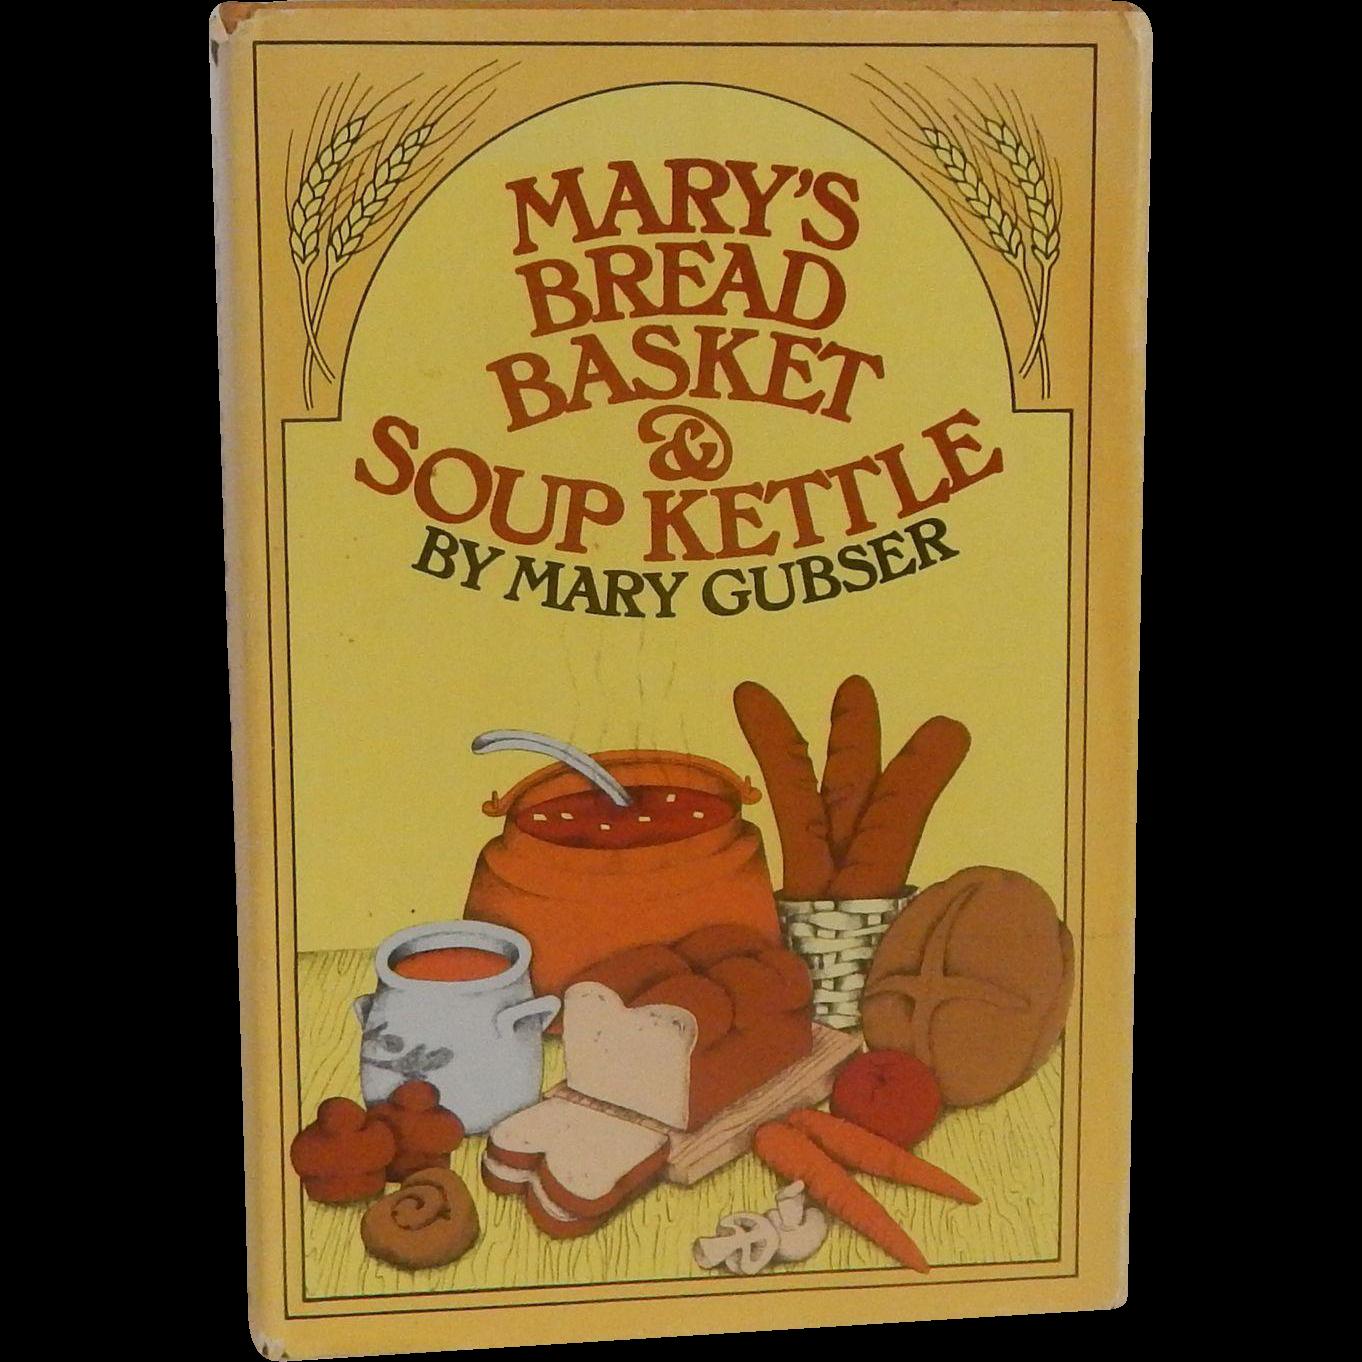 Mary's Bread Basket & Soup Kettle